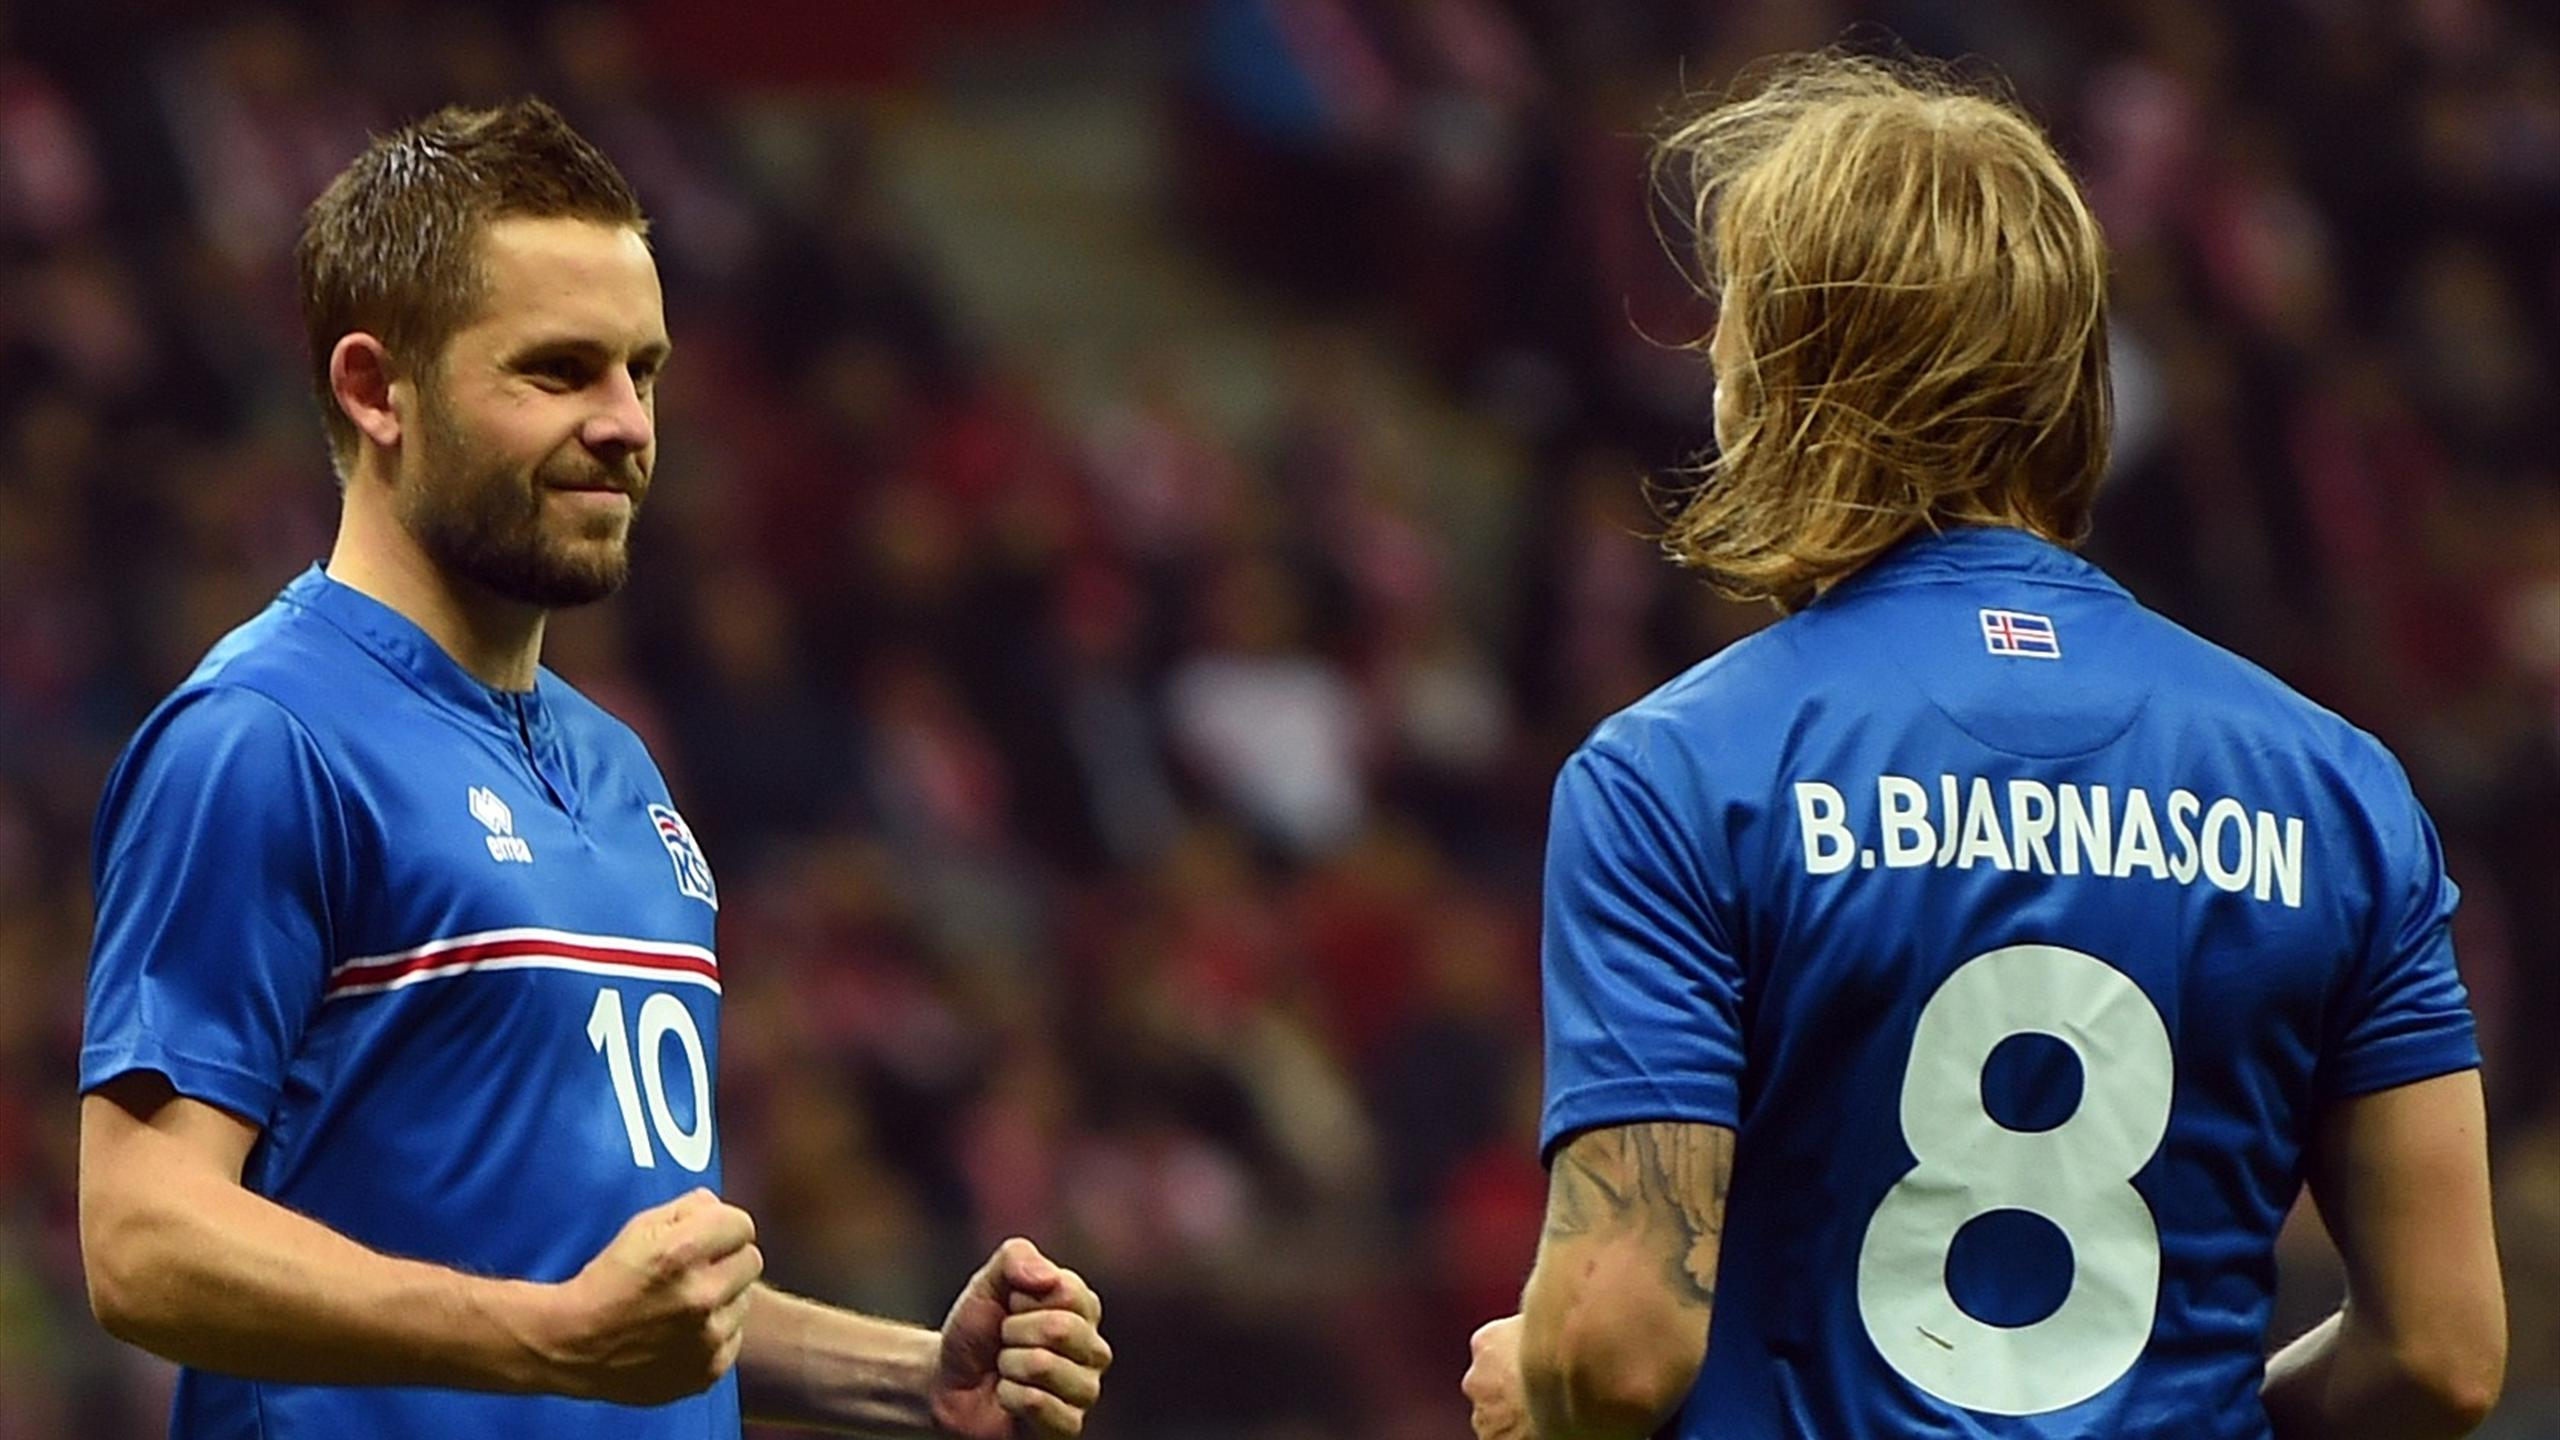 Iceland's Gylfi Sigurdsson and Birkir Bjarnason celebrate